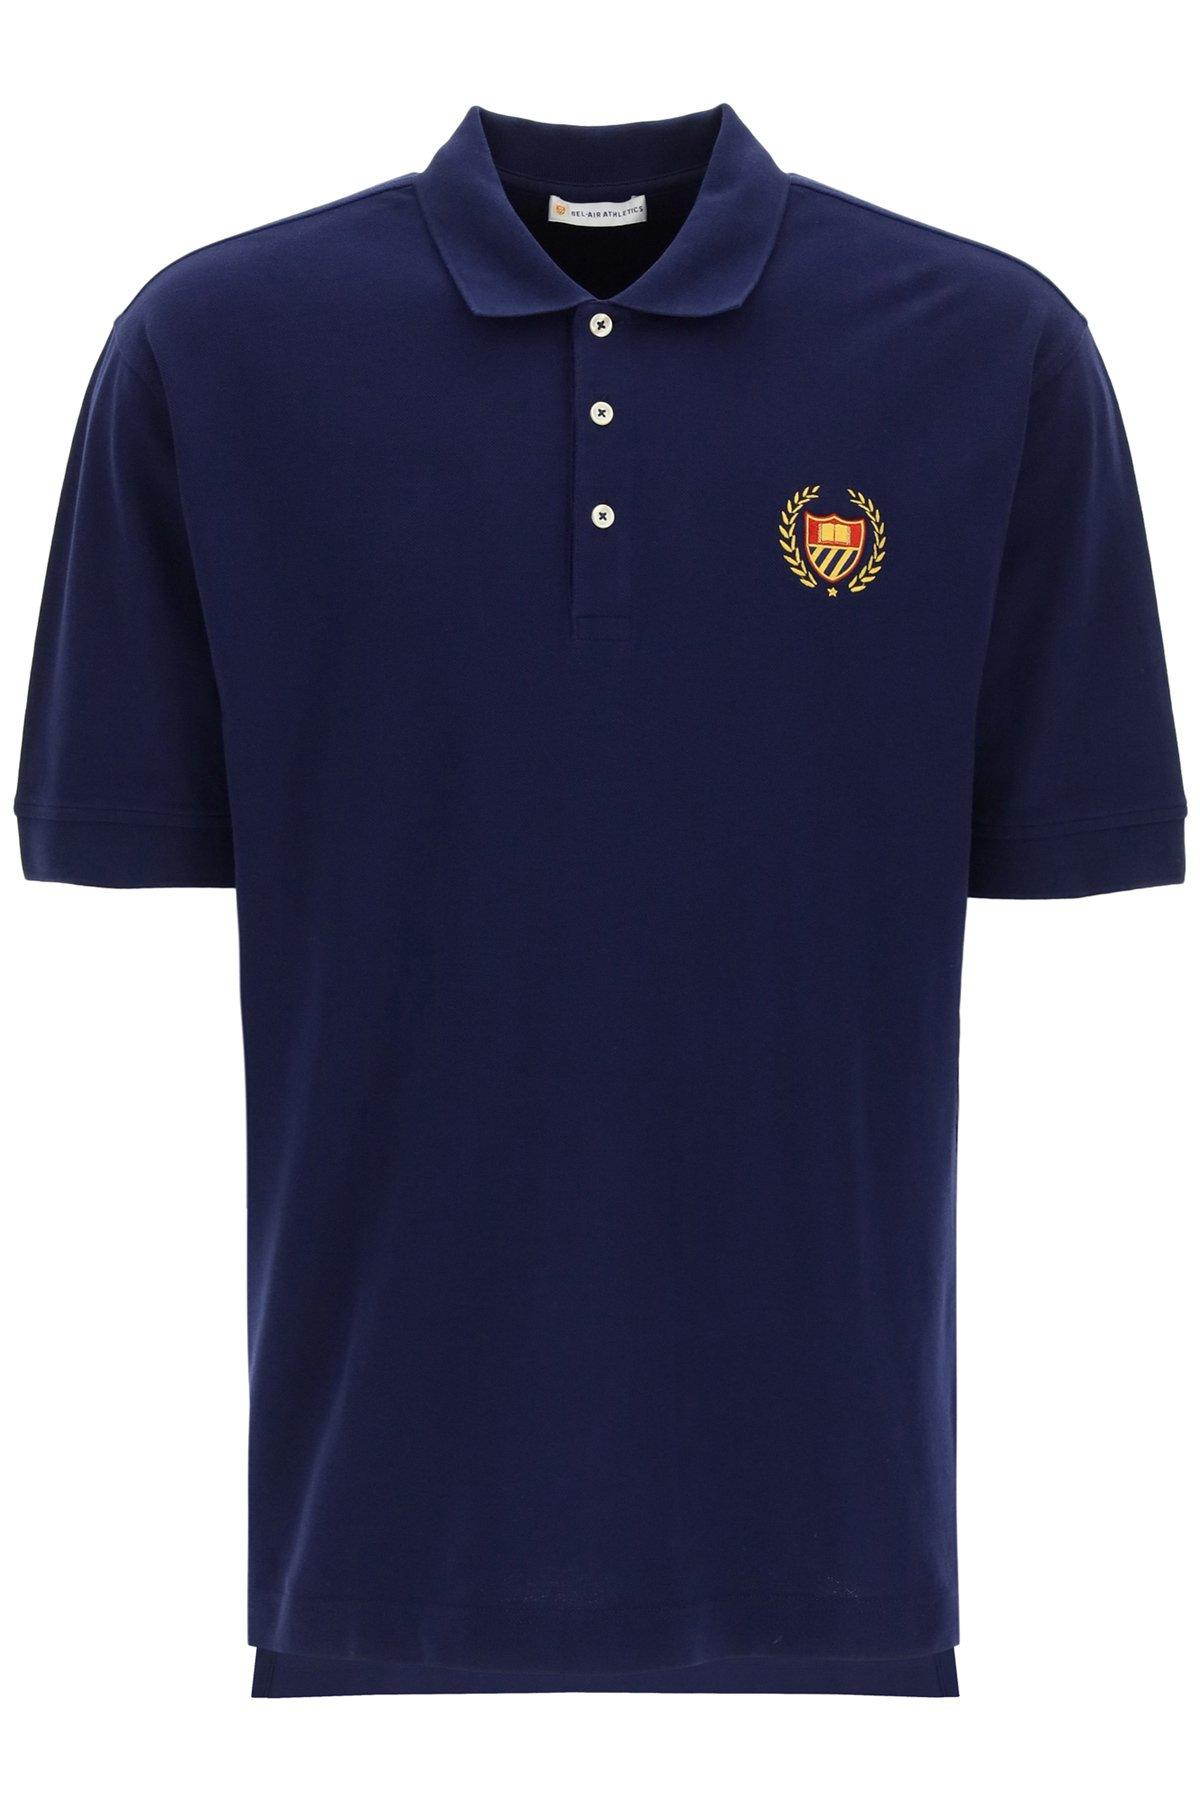 Bel-air athletics polo academy crest